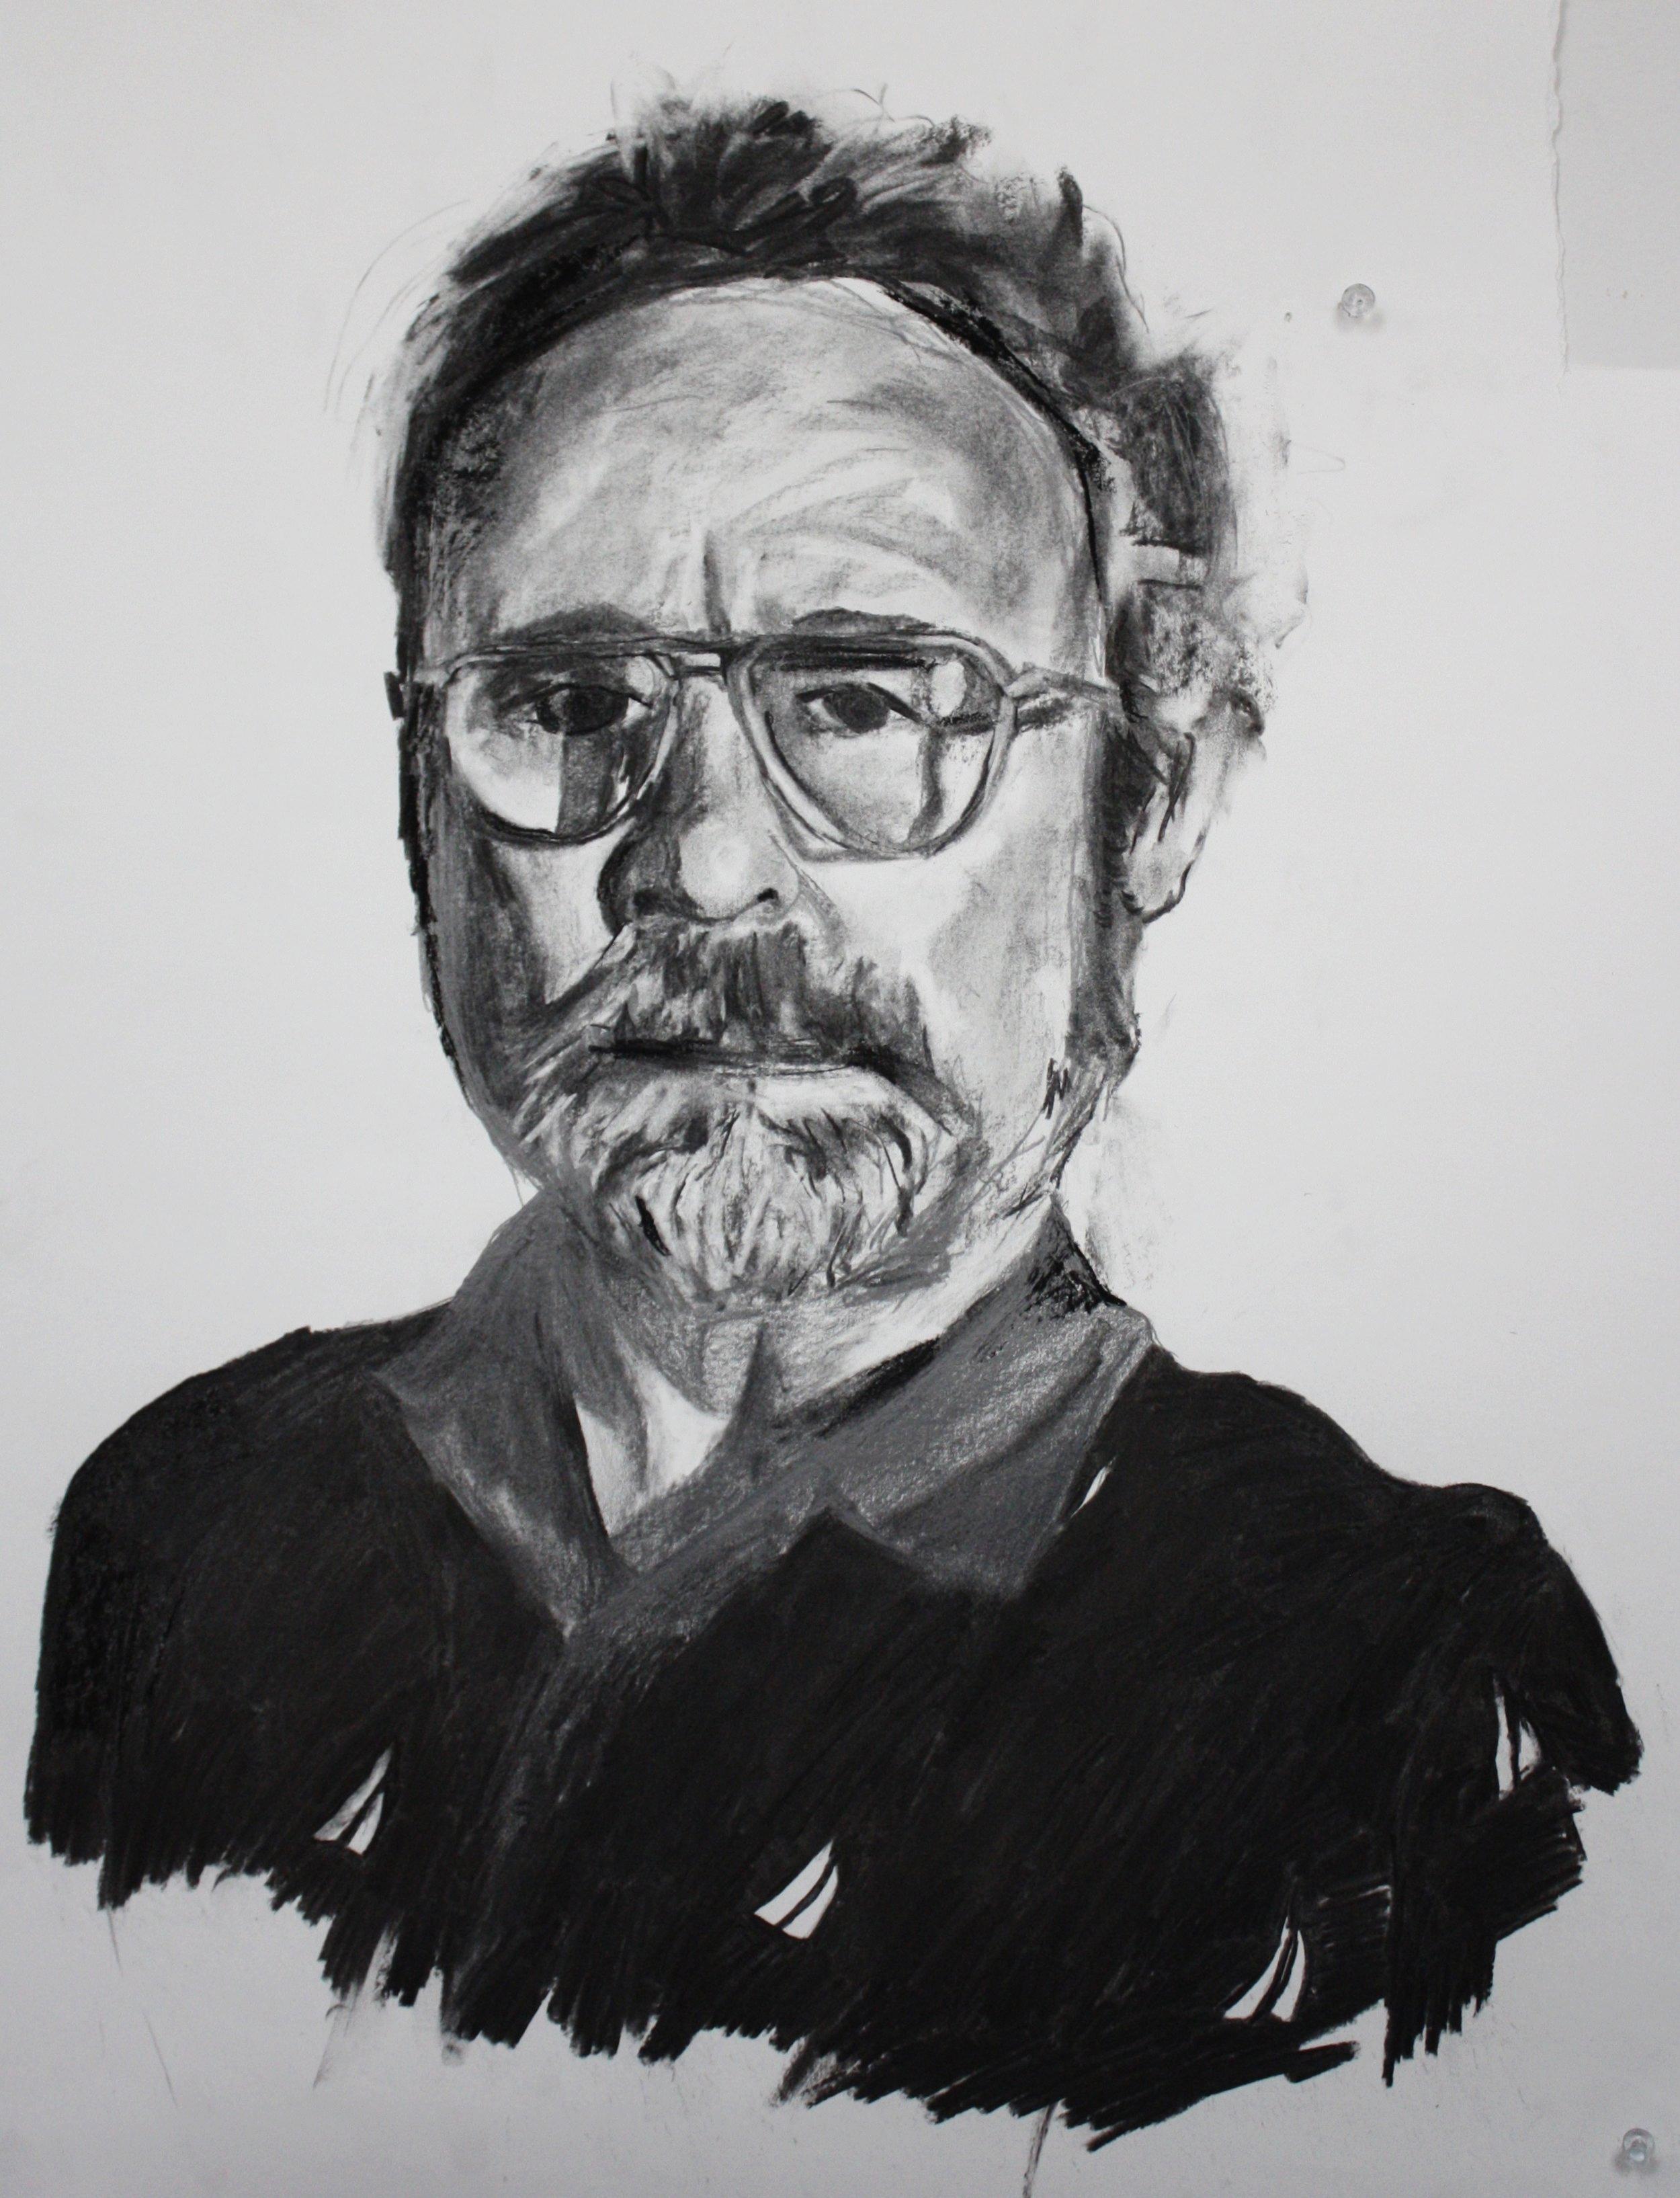 Untitled - Sketch